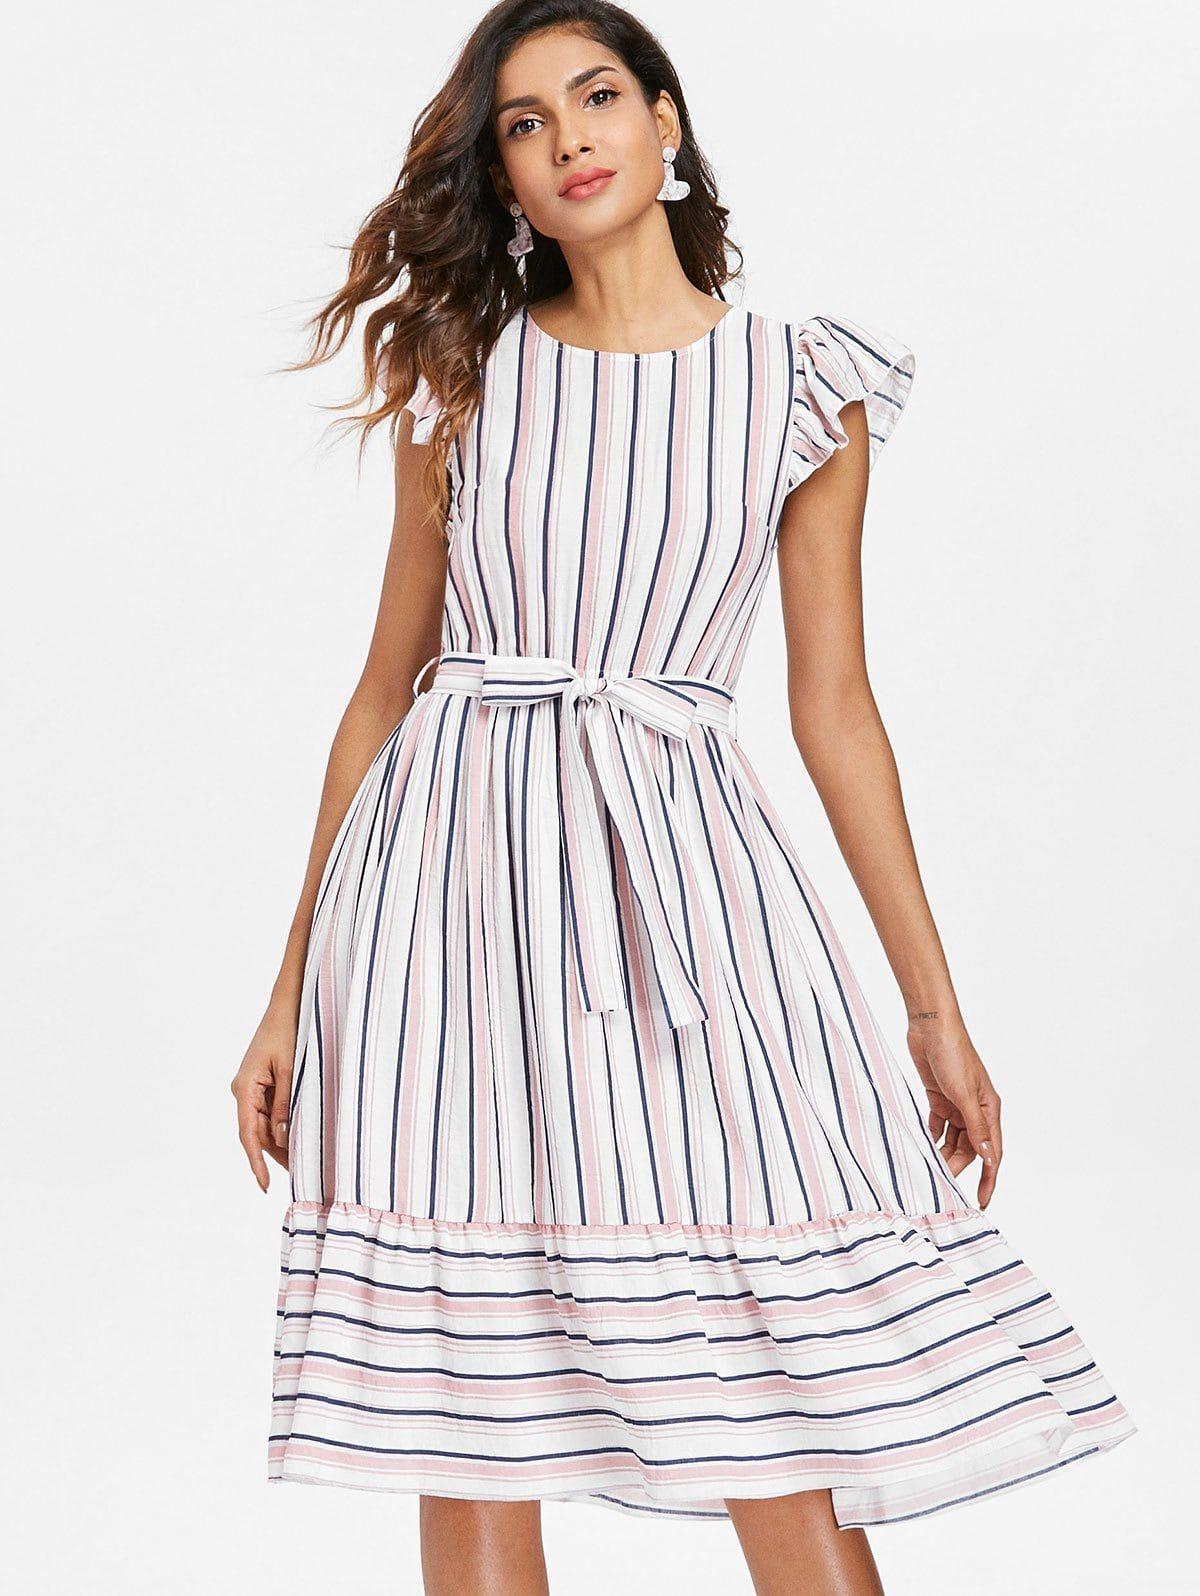 Striped Casual Flounce Dress Multi Sponsored Casual Striped Flounce Multi Dress A Casual Frocks Casual Summer Dresses Knee Length Flounced Dress [ 1596 x 1200 Pixel ]